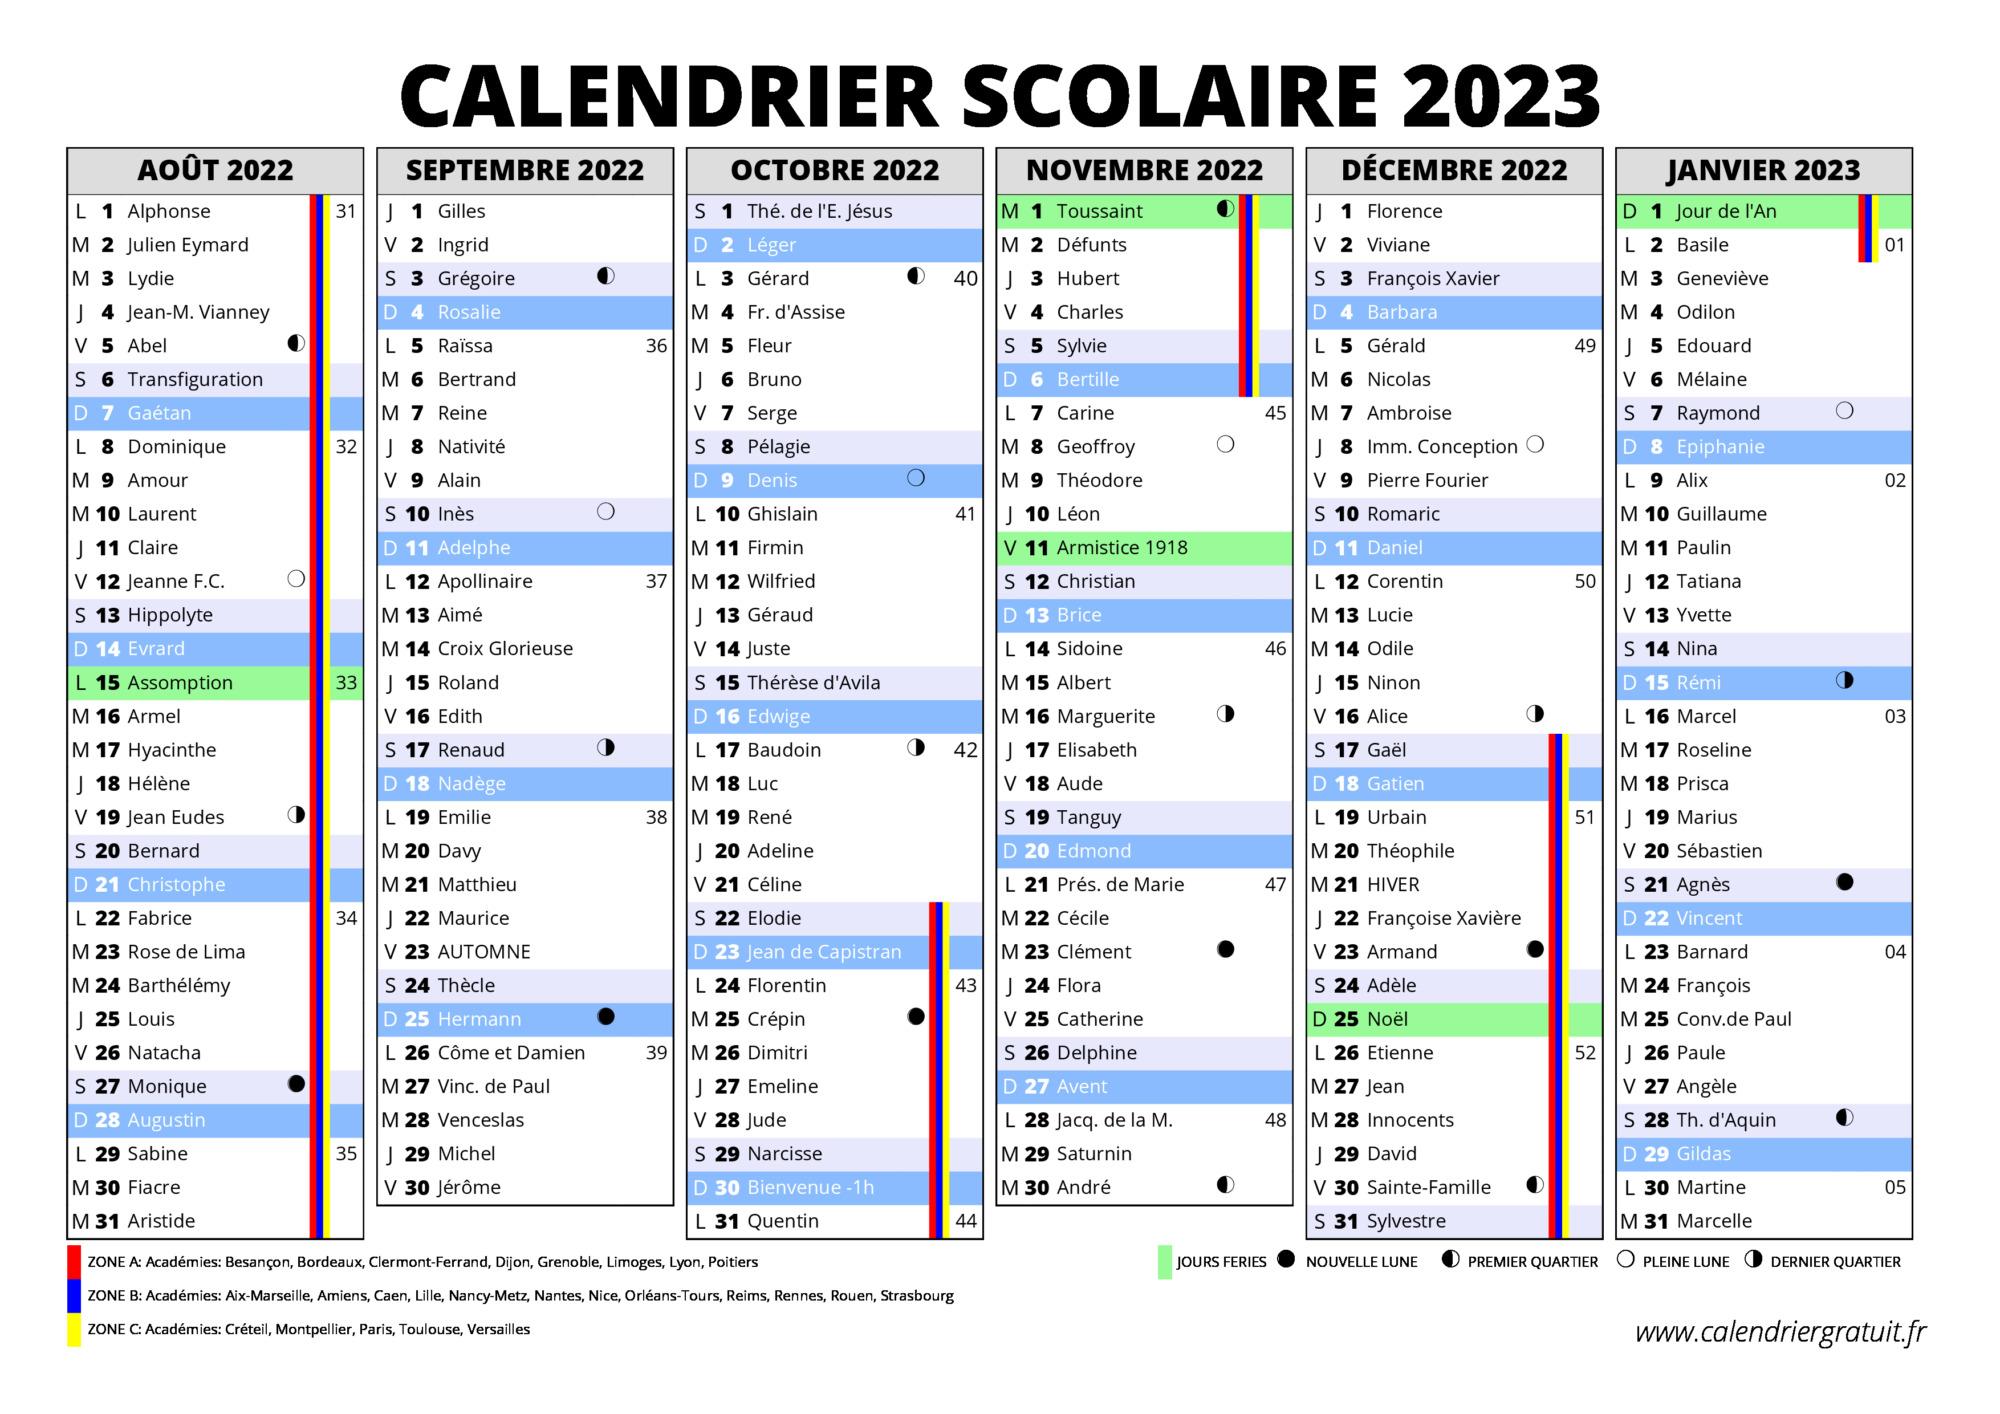 Calendrier Excel 2022 2023 Calendrier Excel Vacances Scolaires 2022 2023   Calendrier Novembre